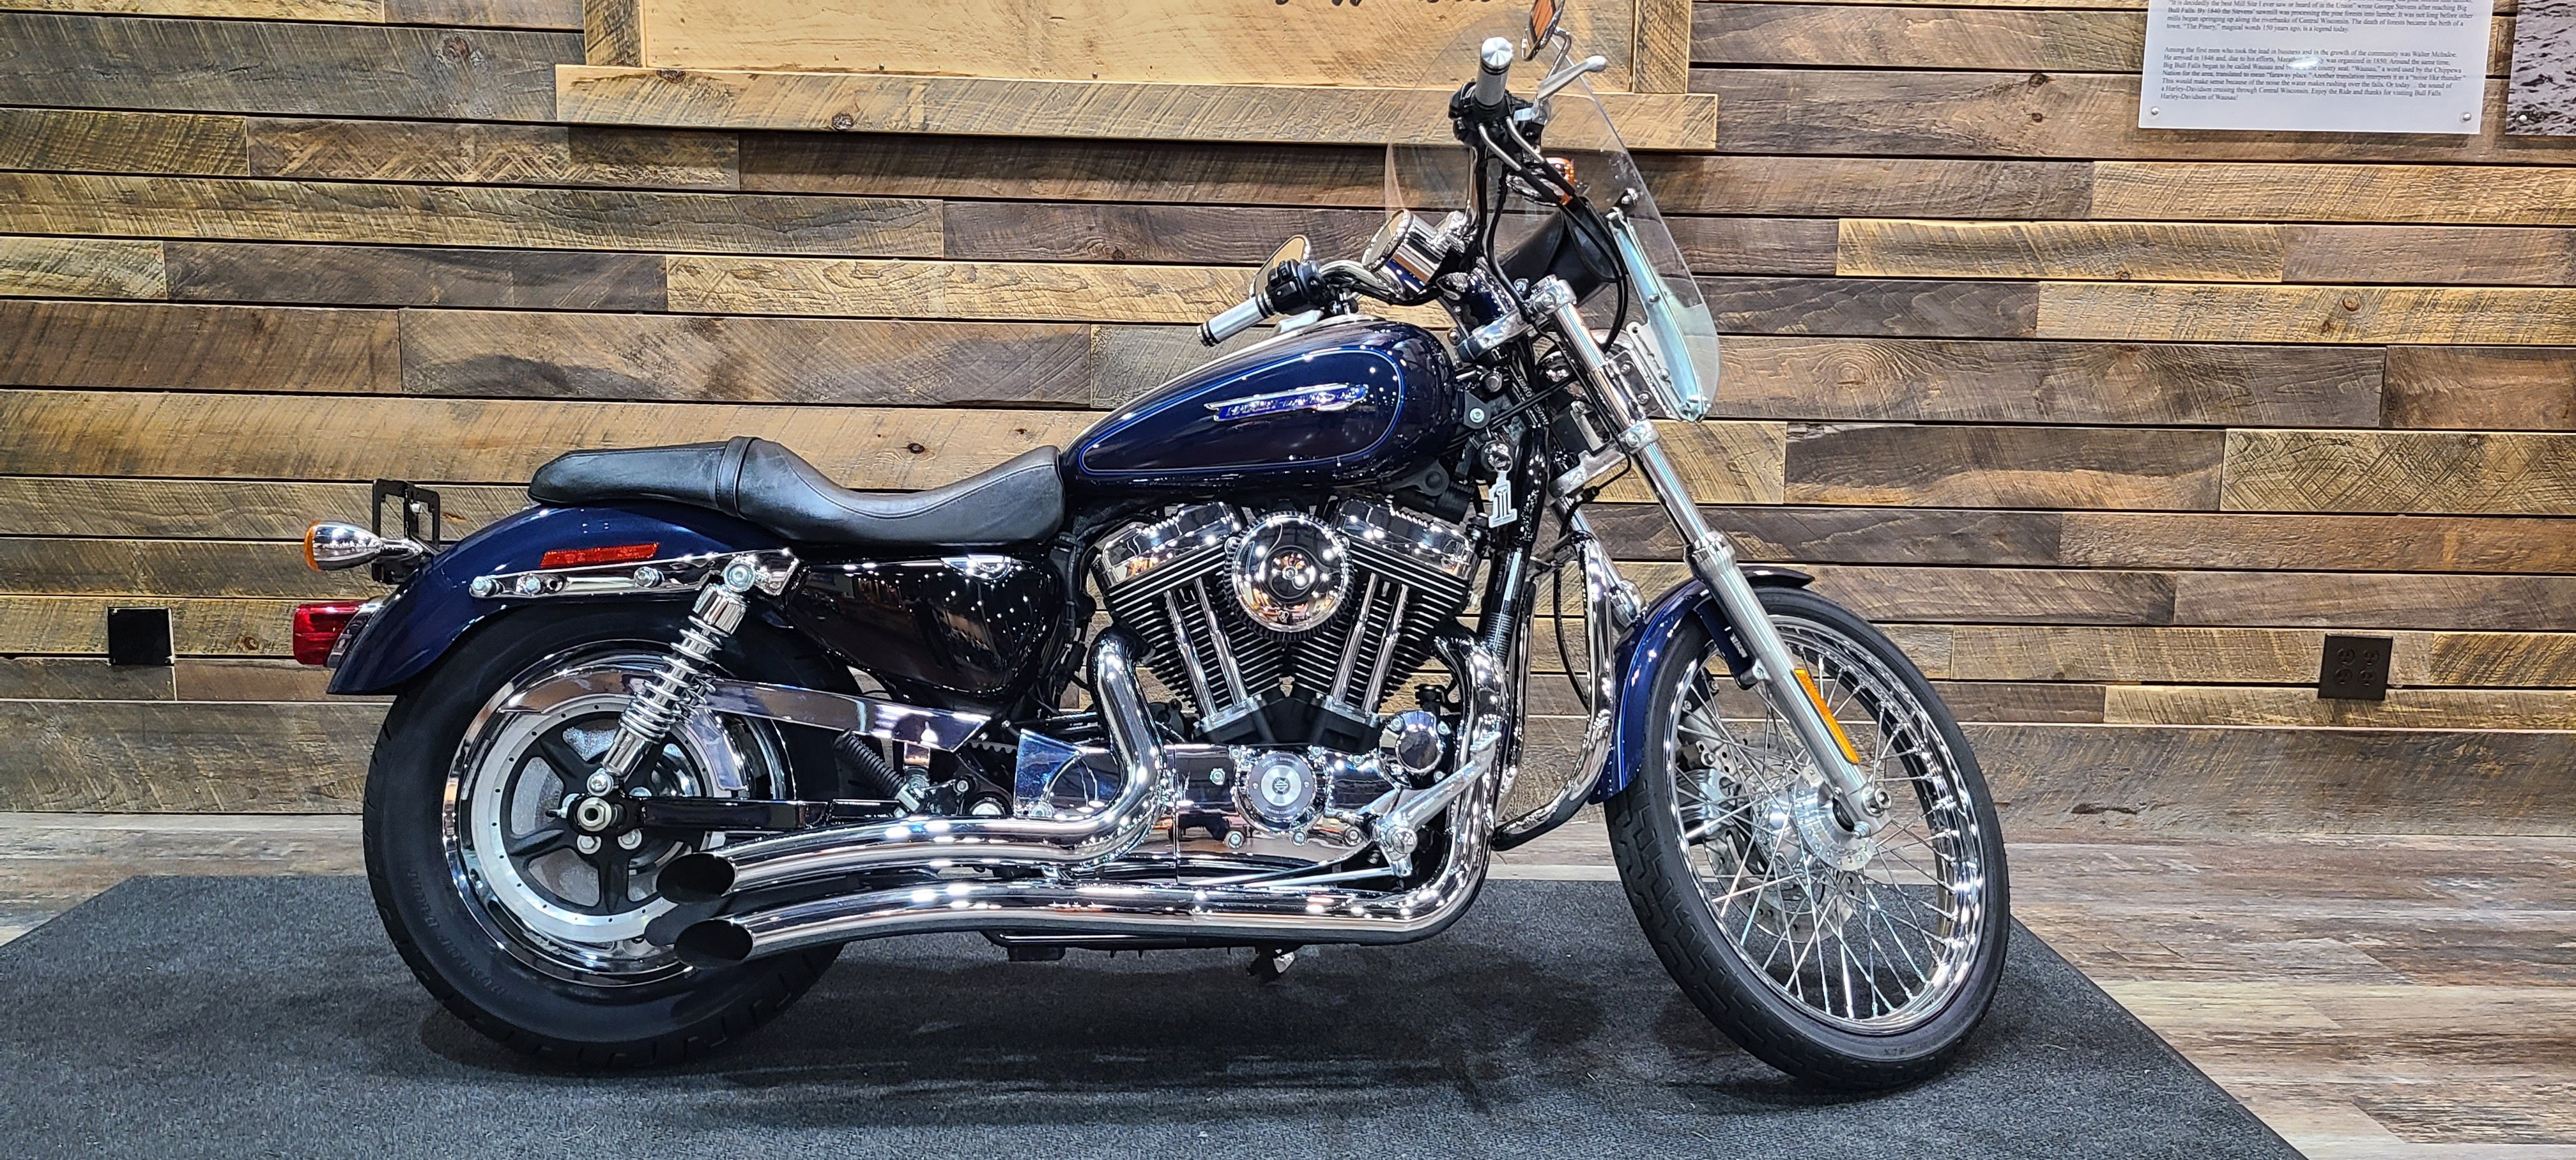 2009 Harley-Davidson Sportster 1200 Custom at Bull Falls Harley-Davidson